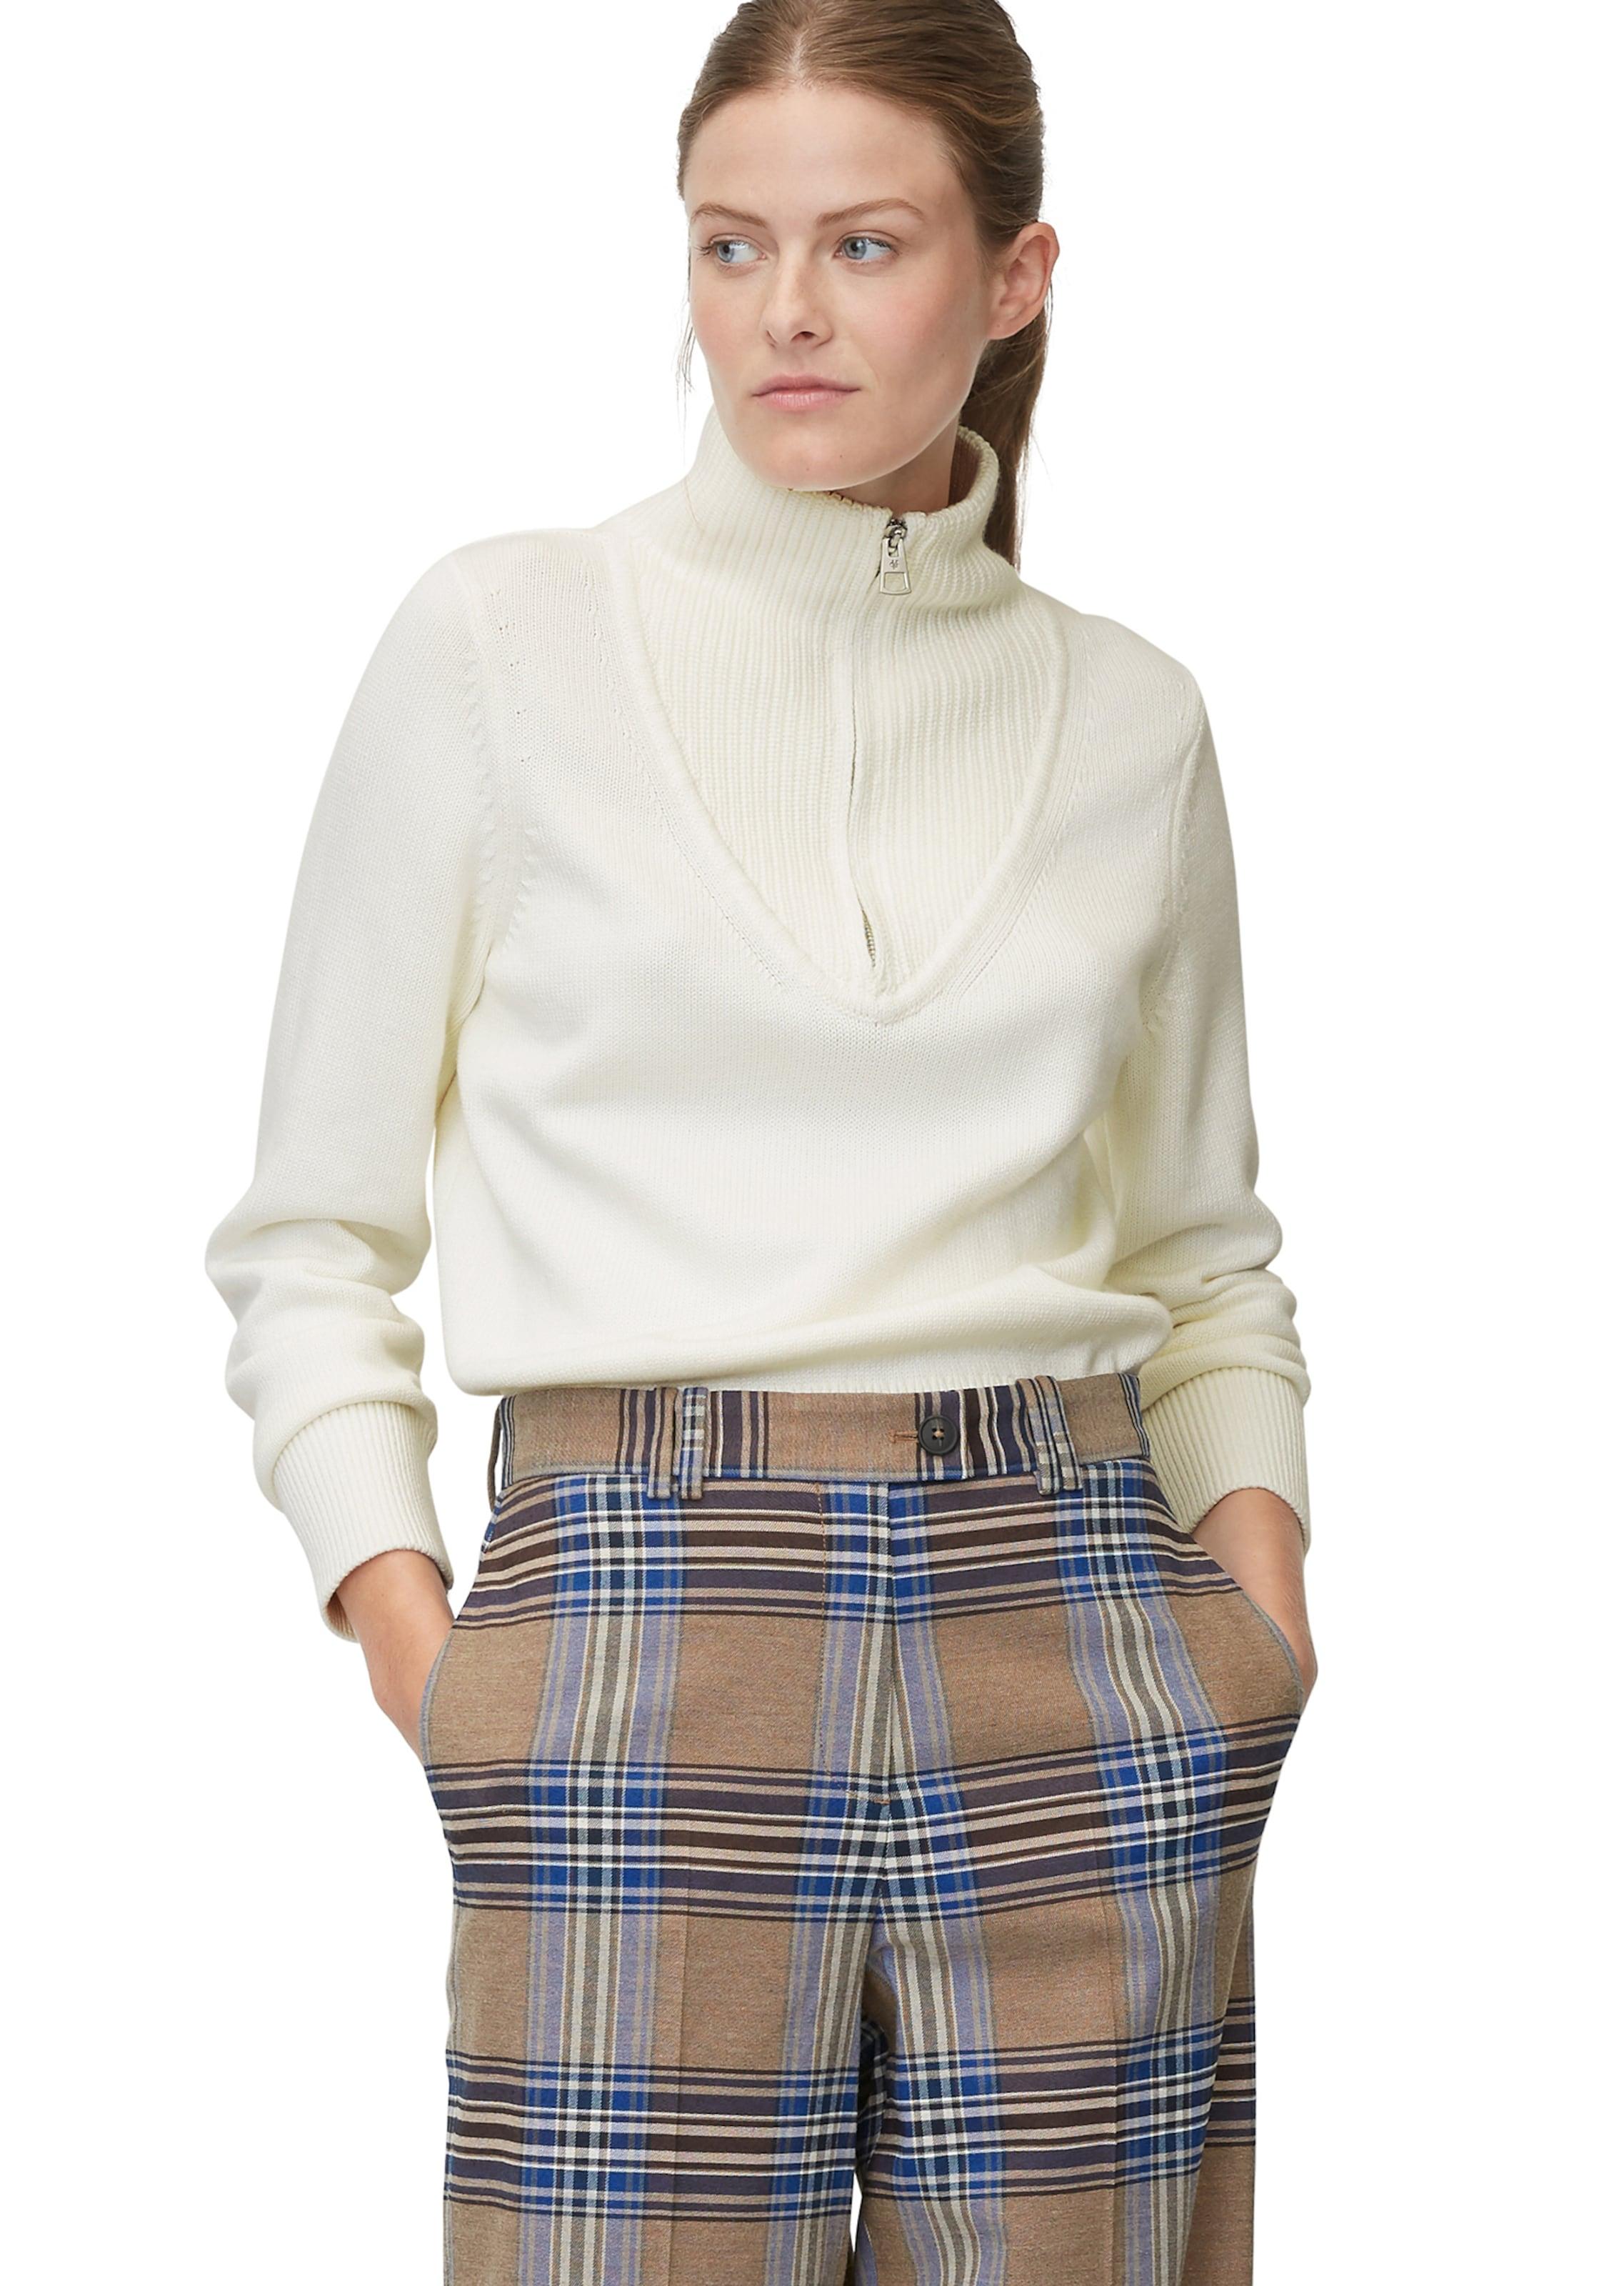 Offwhite Pullover In O'polo O'polo In Marc Marc Offwhite Pullover tQrsdh